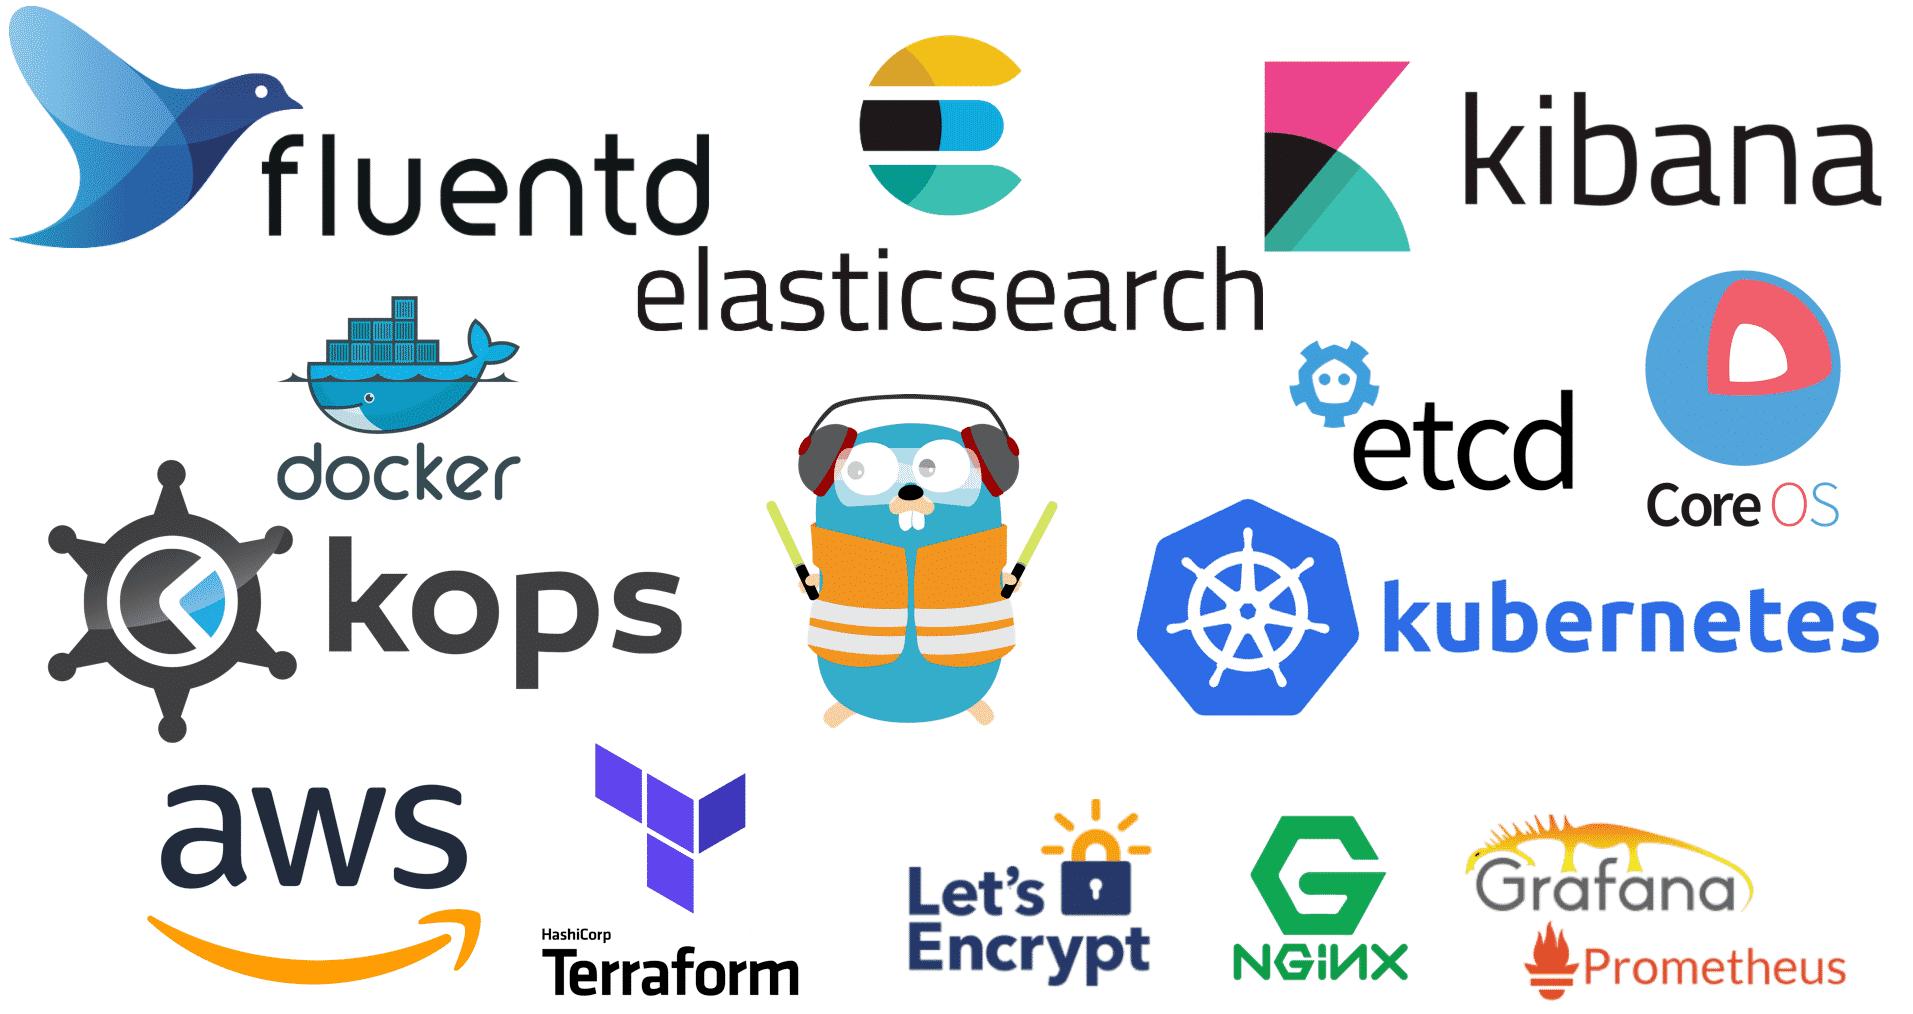 Kubernetes with kops and Traefik HA (Let's encrypt wildcard) + metrics prometheus + grafana-dashboards + efk stack + app1 + hpa testing.